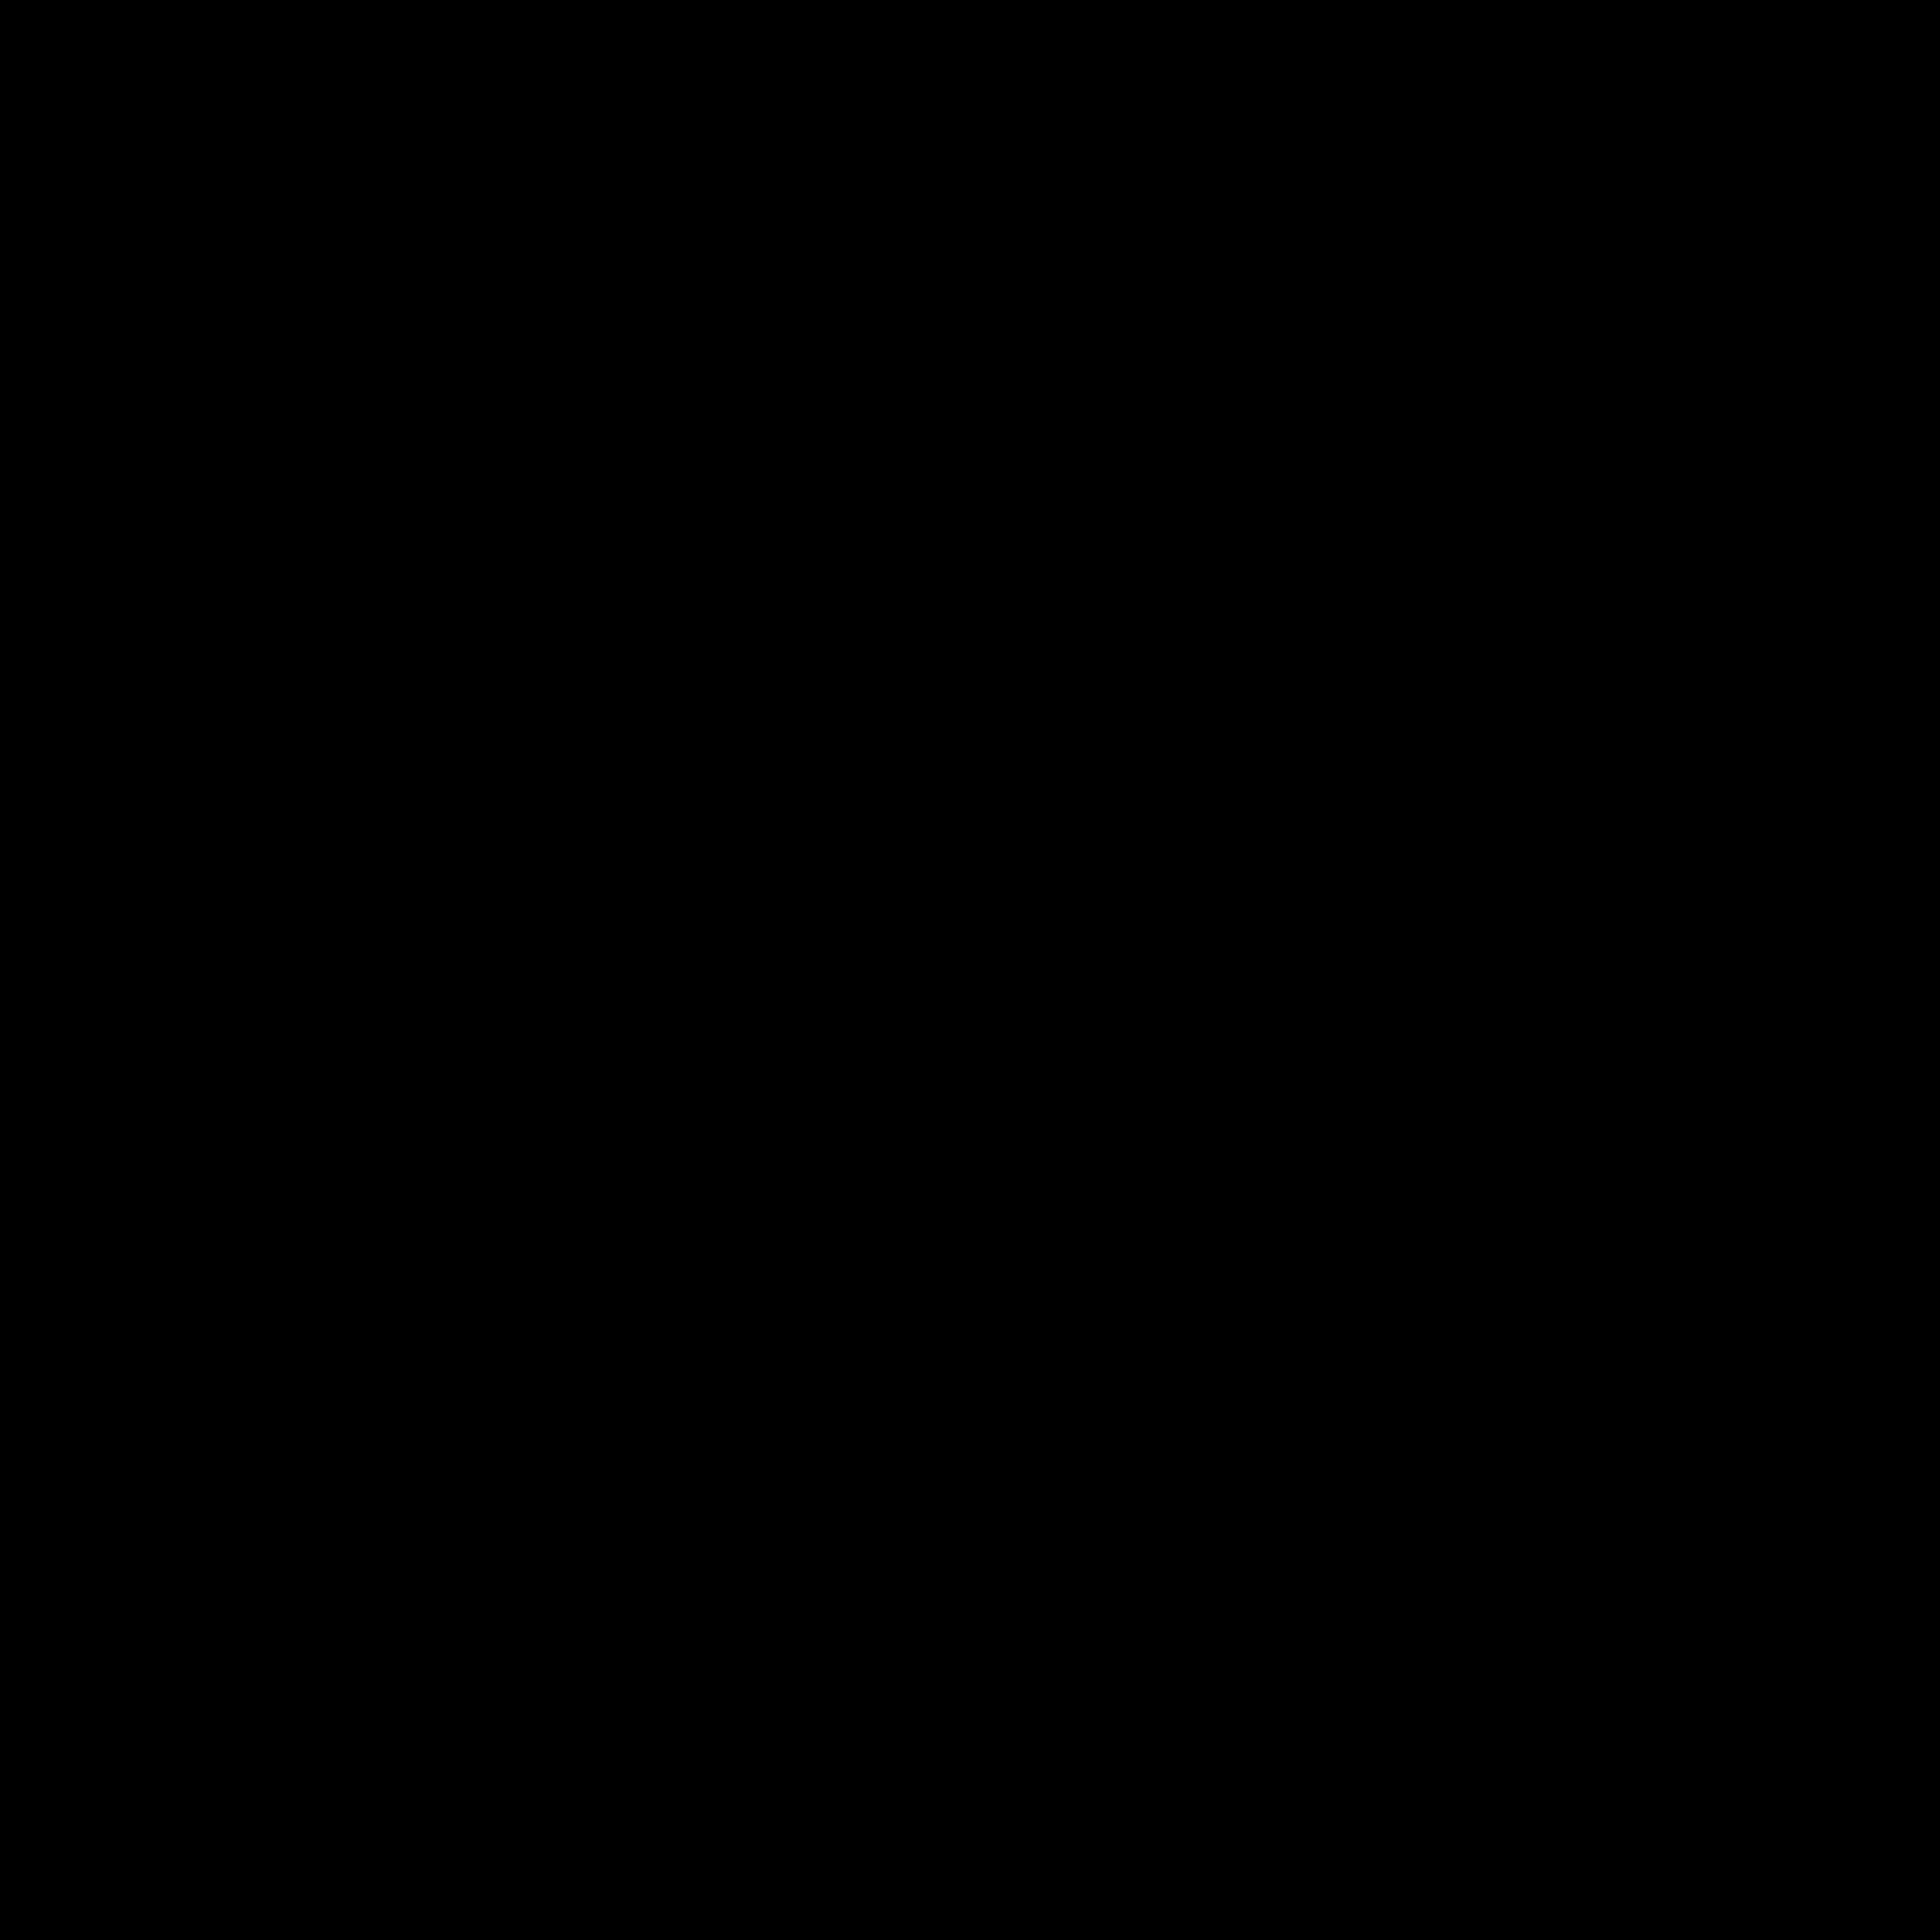 Gov explore bw seal. Crawfish clipart symbol louisiana